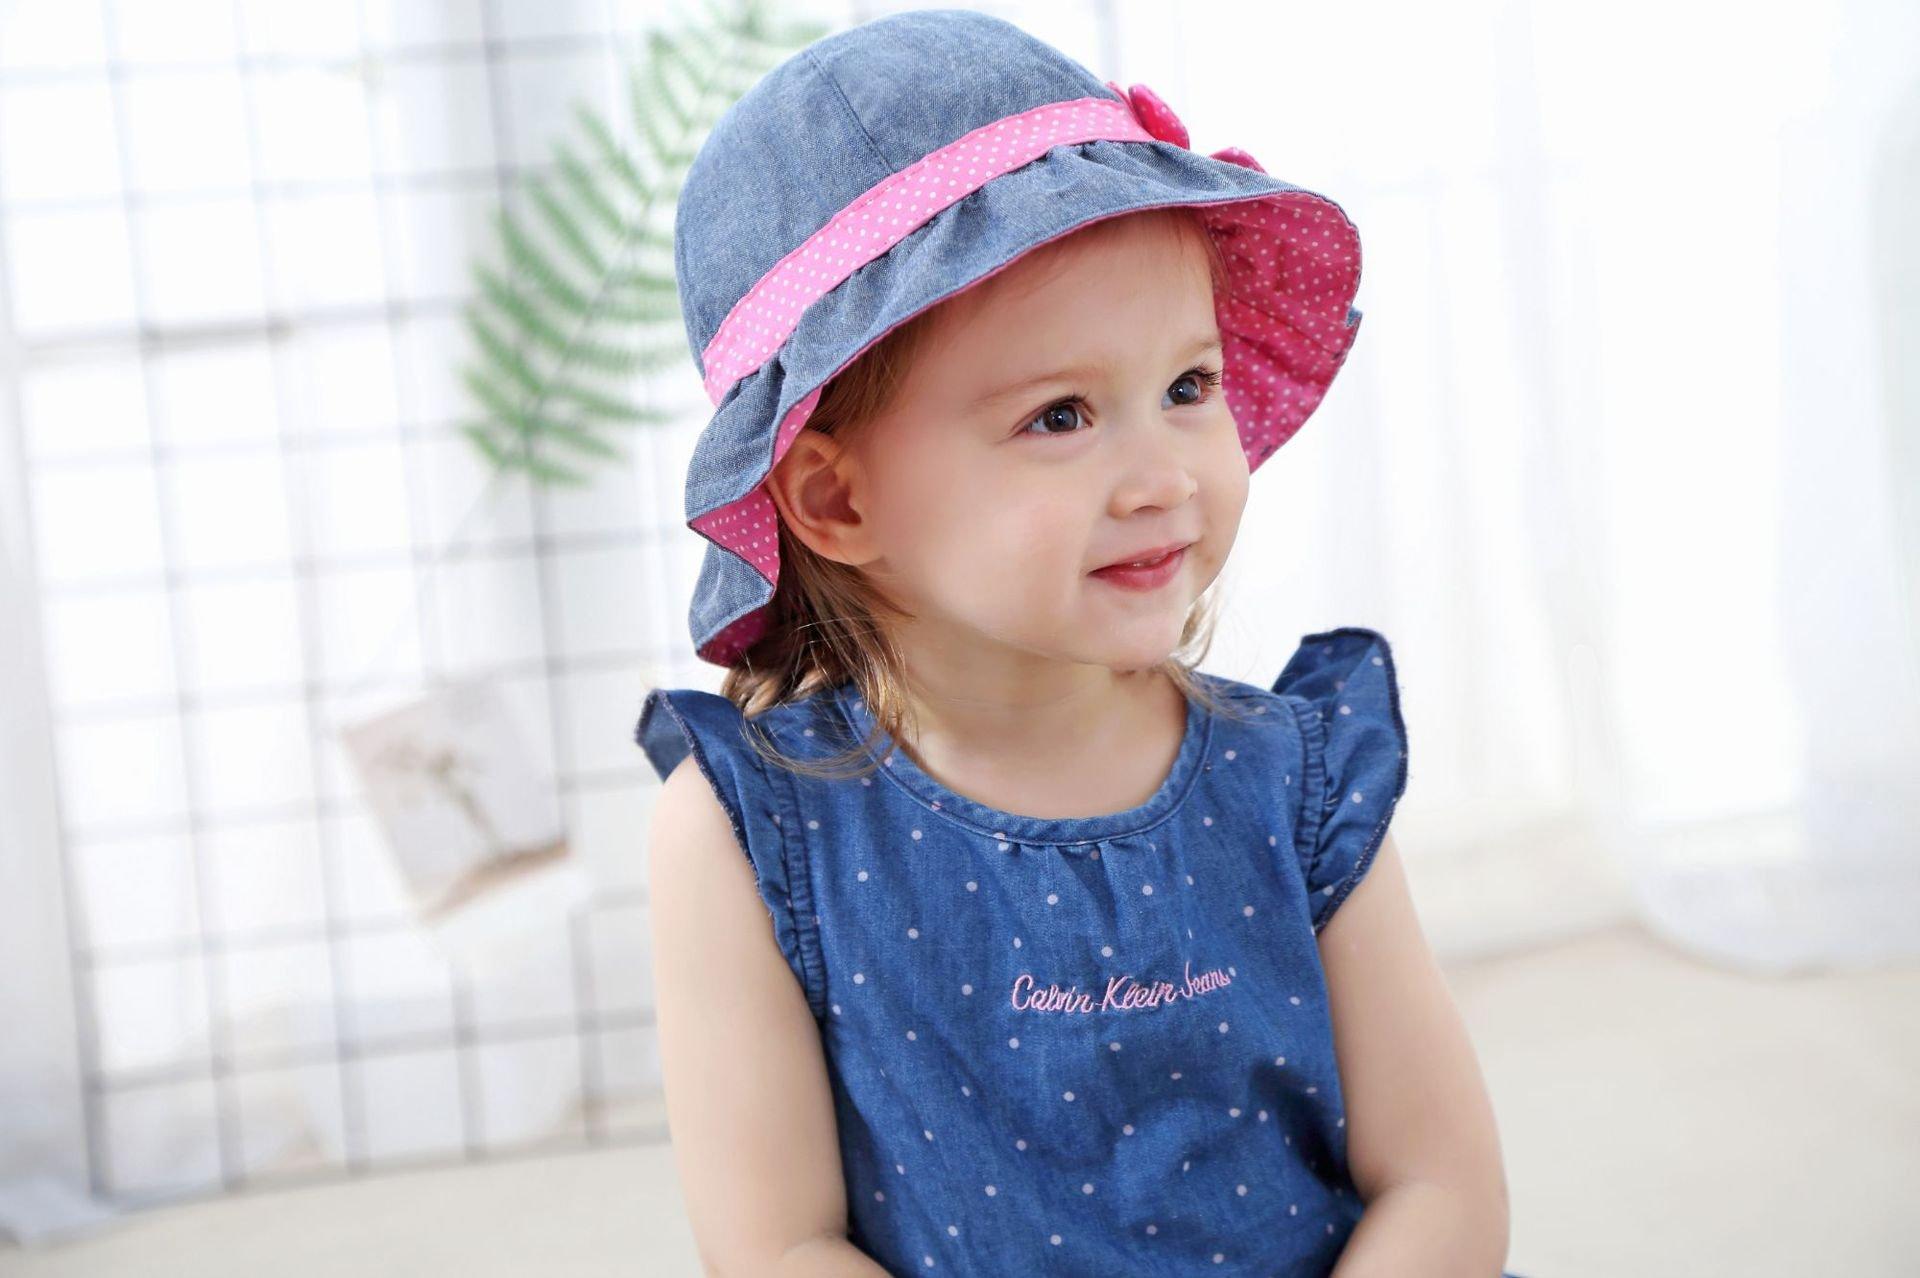 Toddler Baby Girls Denim Sun Hats with Chin Strap Kid Summer Cotton Sunhat Polka Dot Caps by HUIXIANG (Image #5)